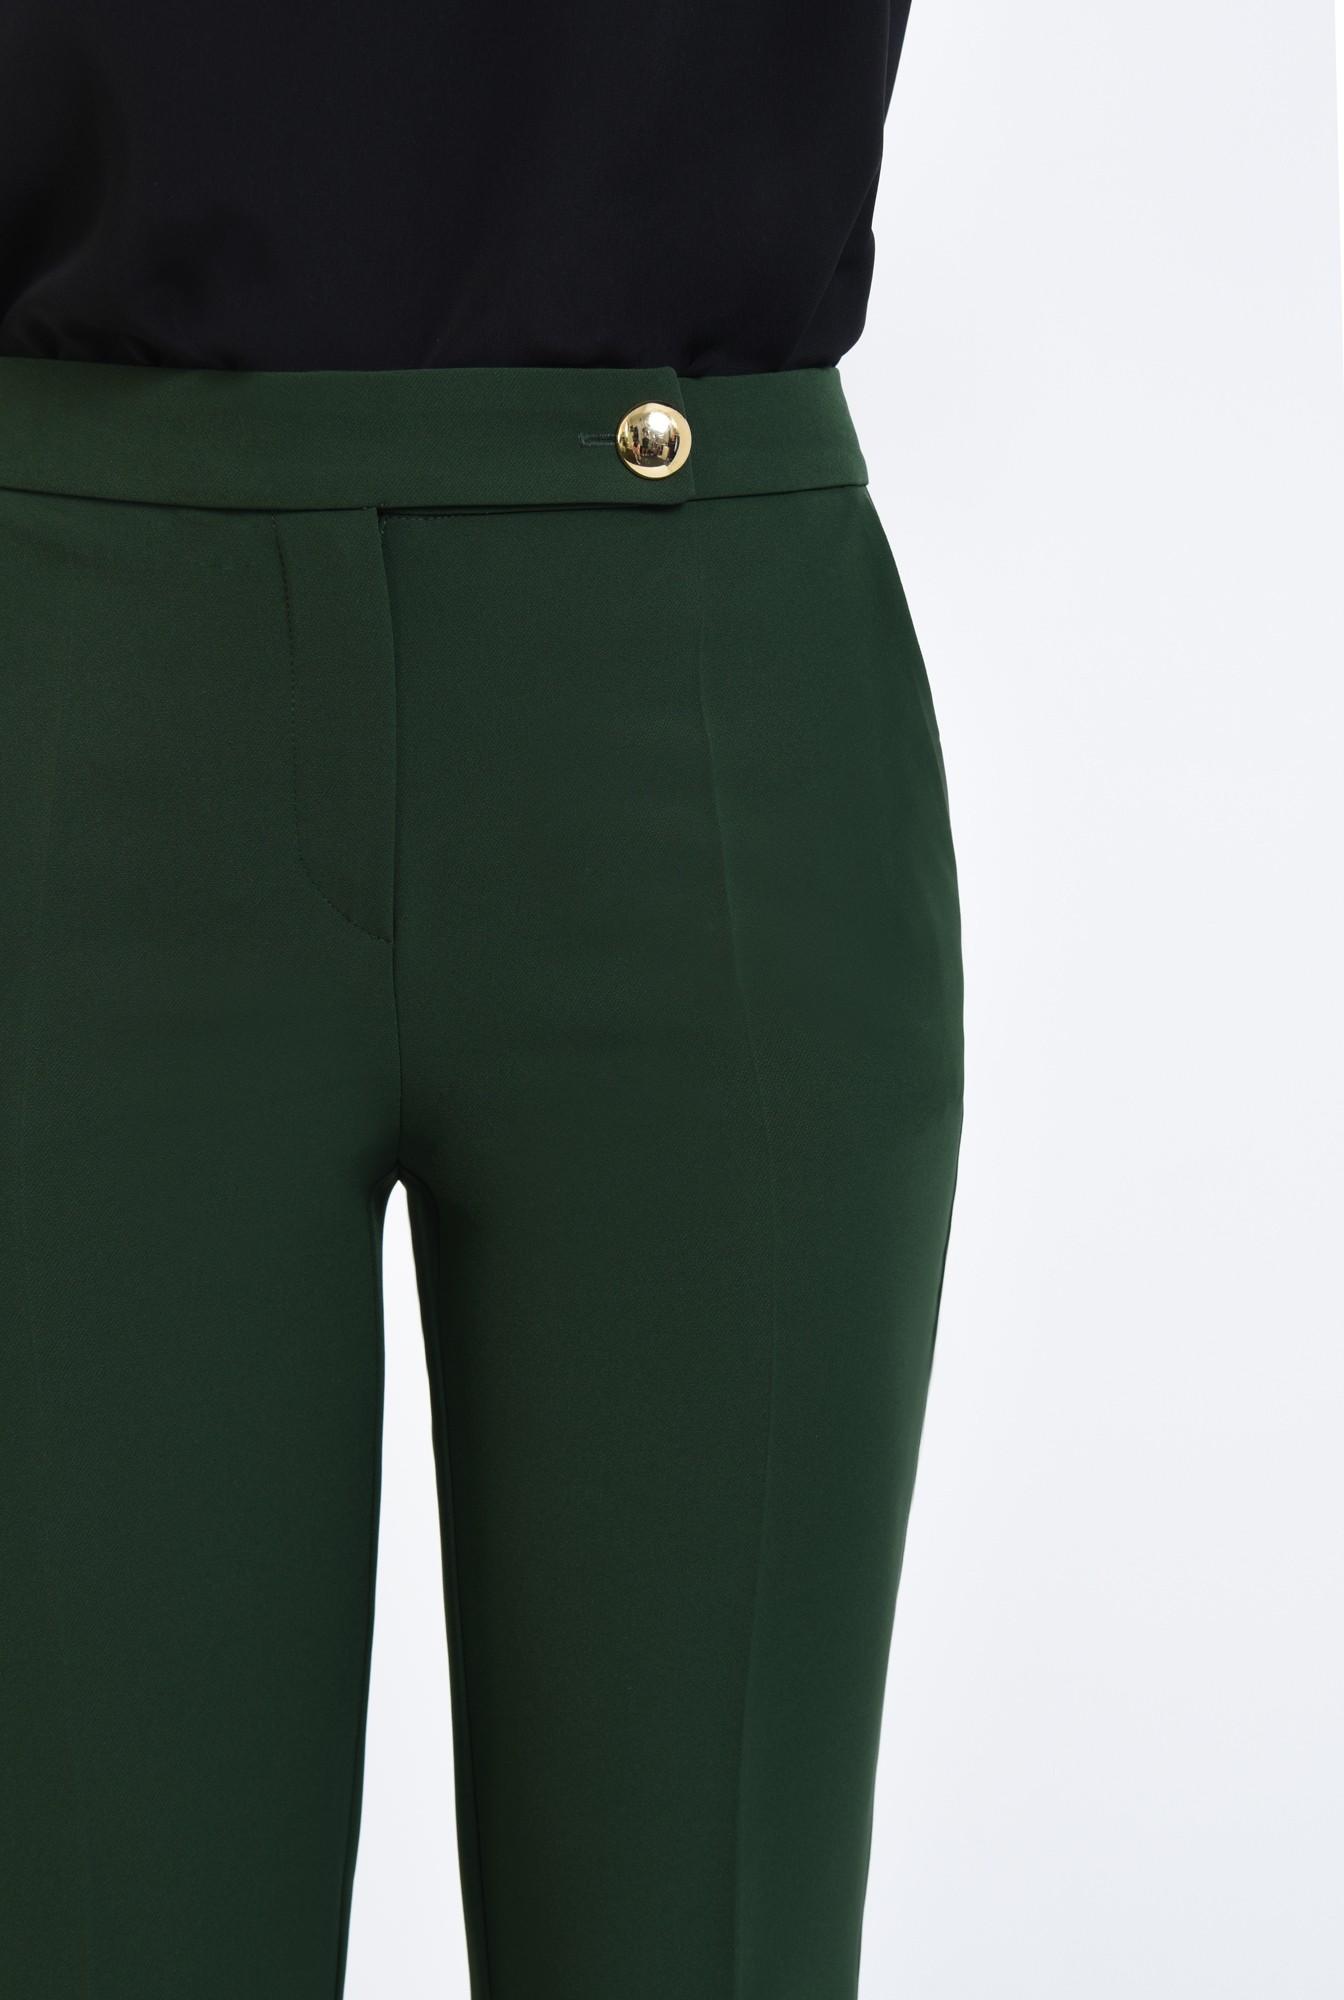 2 - pantaloni casual, verde, croi conic, talie medie